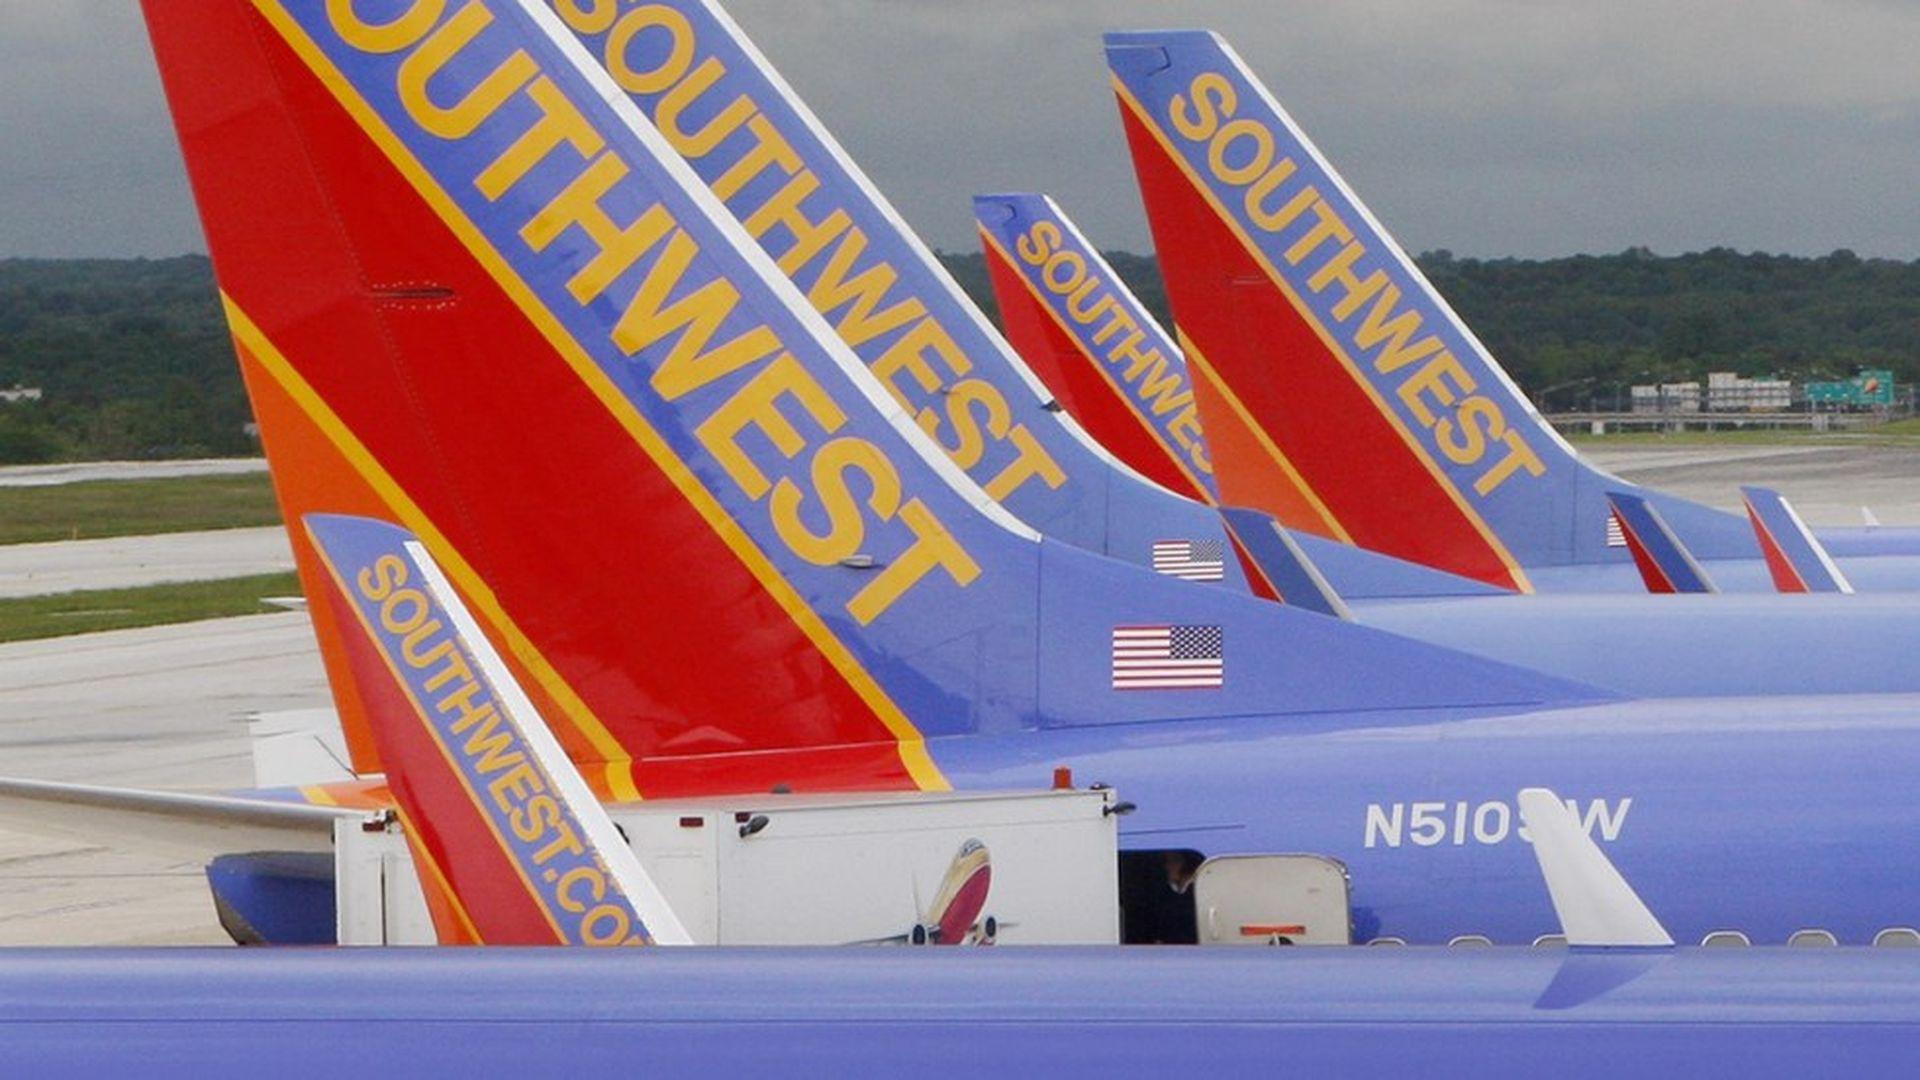 social southwest airline